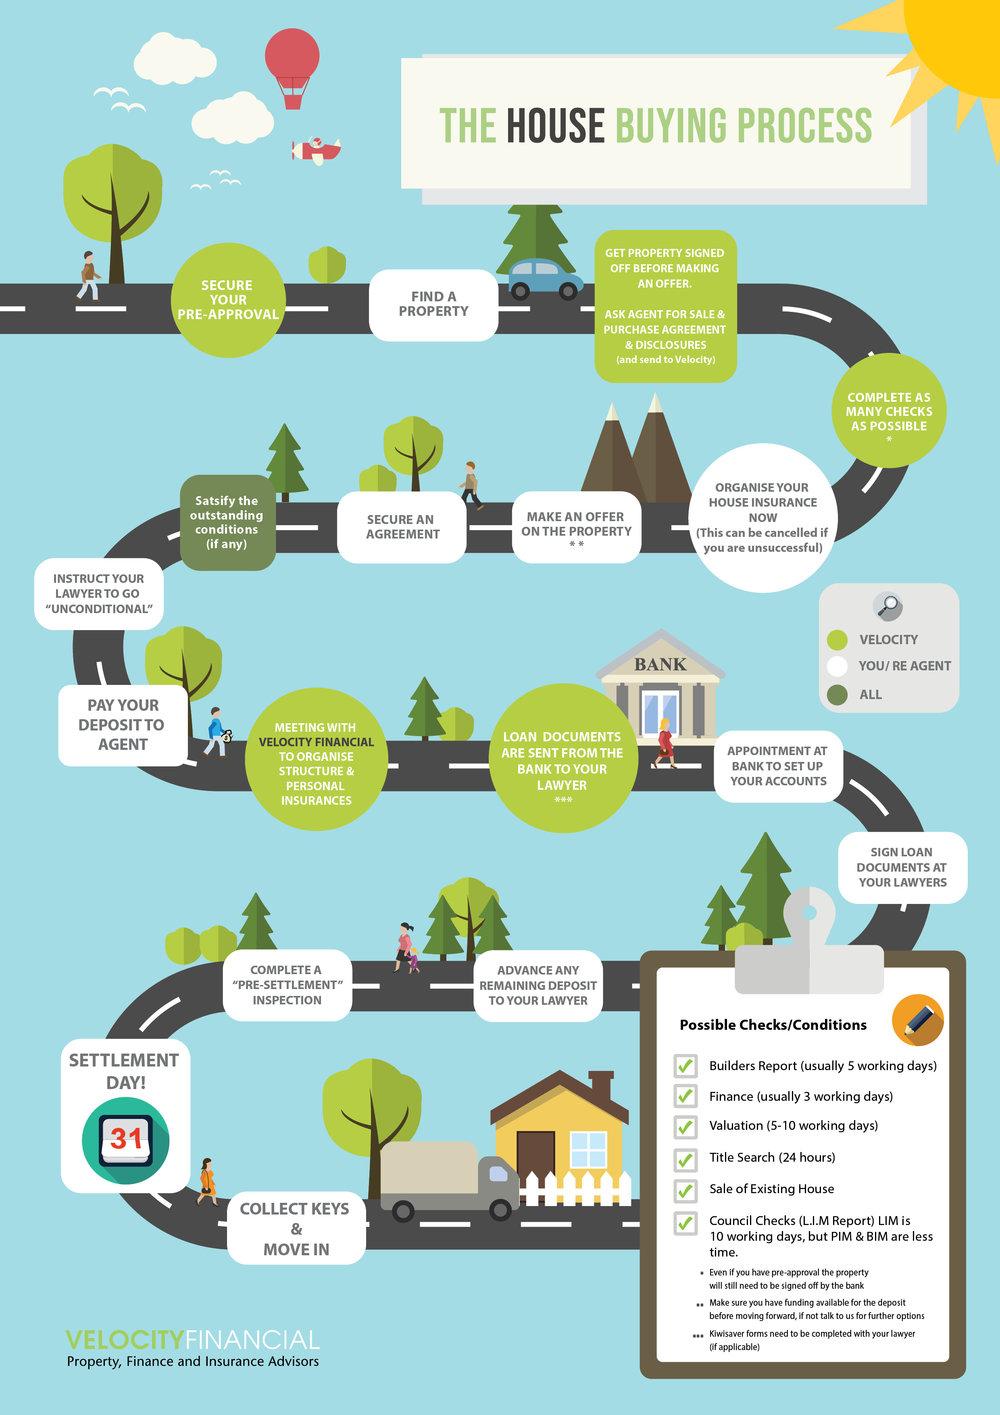 House Buying Process.jpg